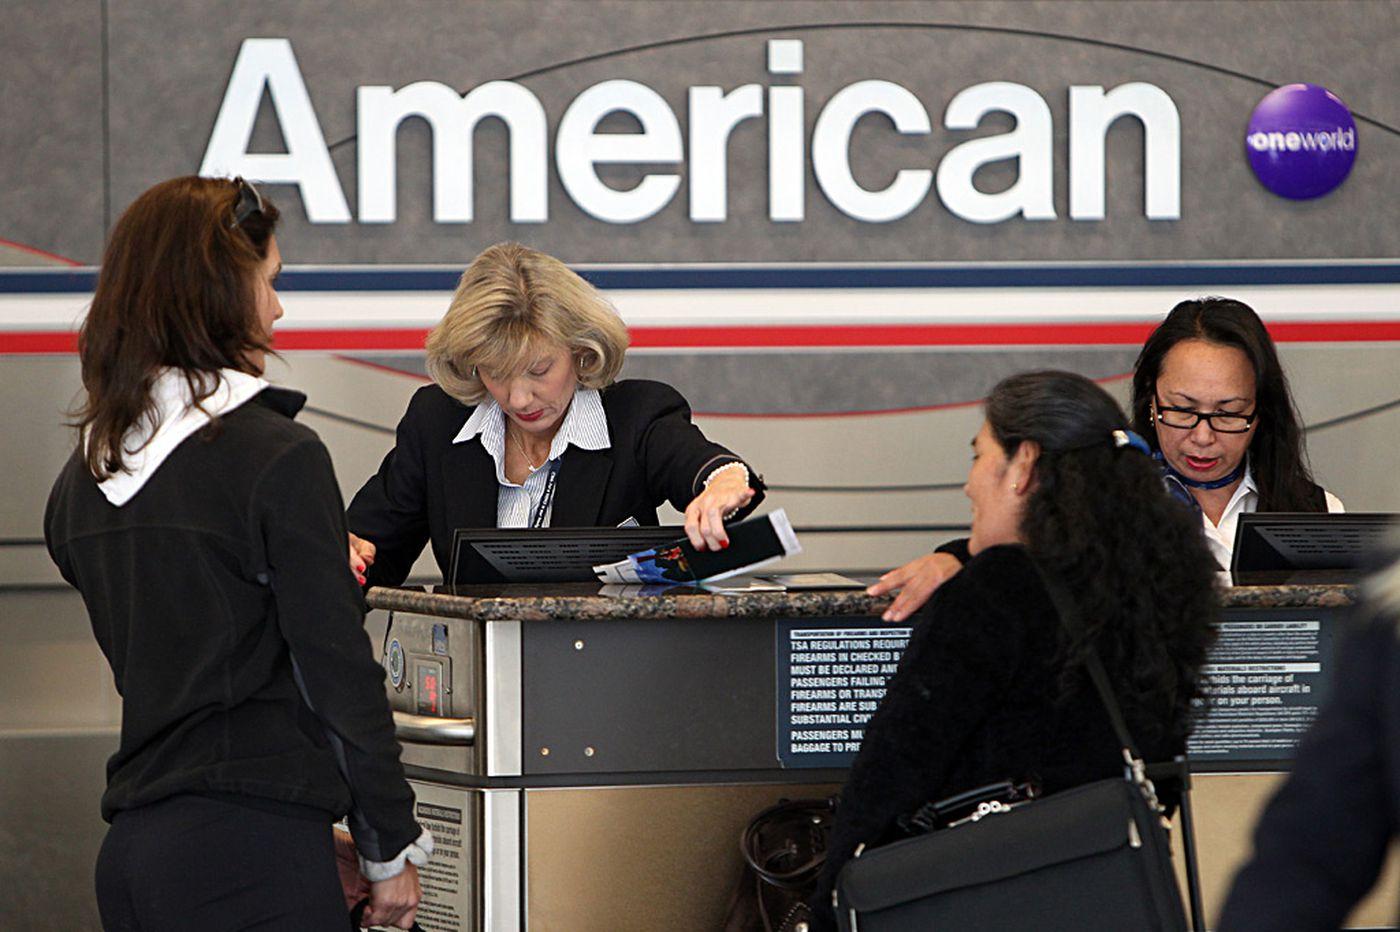 Travel Navigator: How to avoid basic economy class airfares